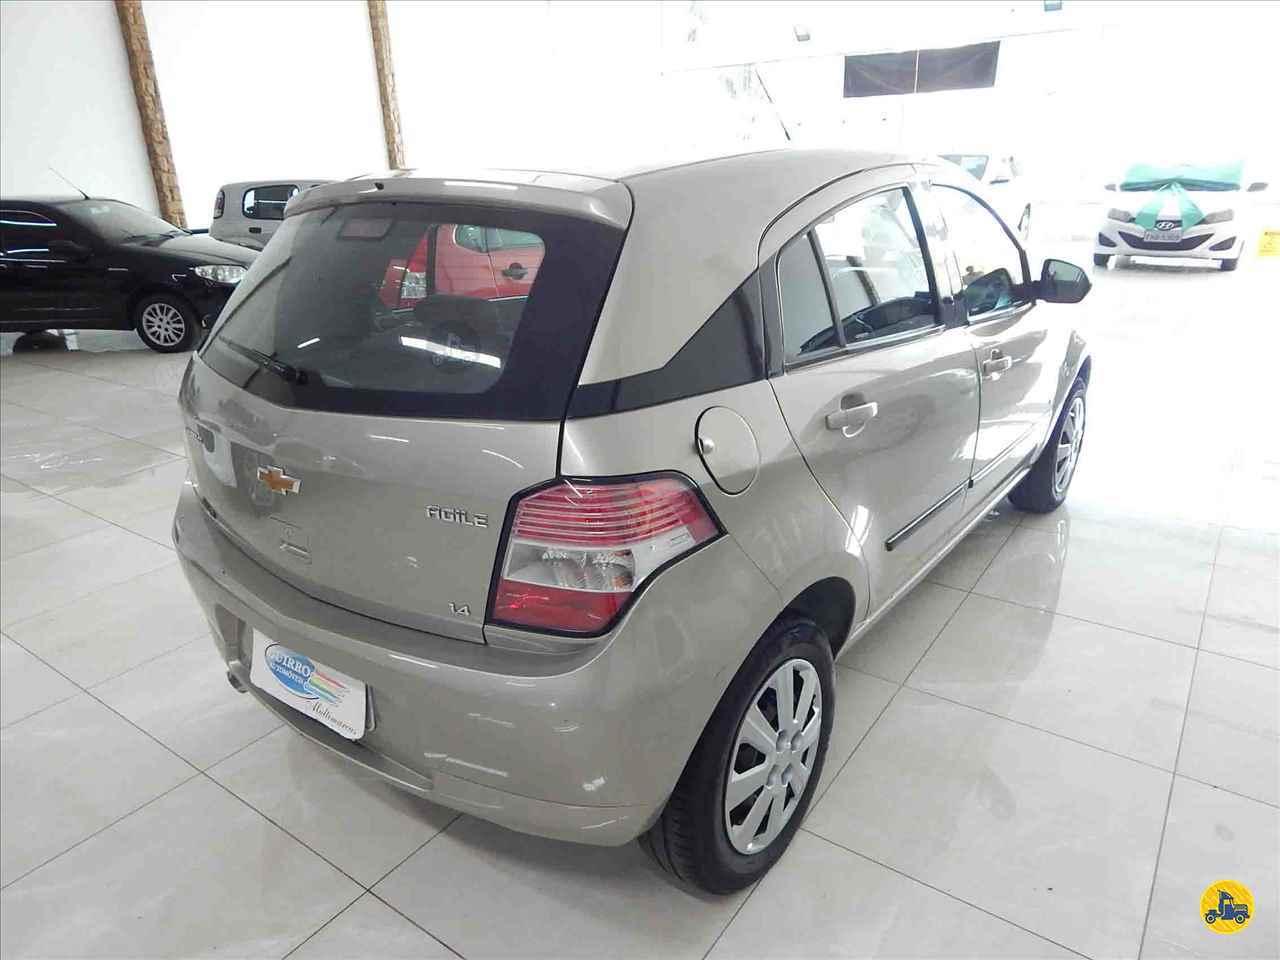 GM - Chevrolet Agile 1.4 LT 318000km 2010/2011 Guirro Automóveis Multimarcas